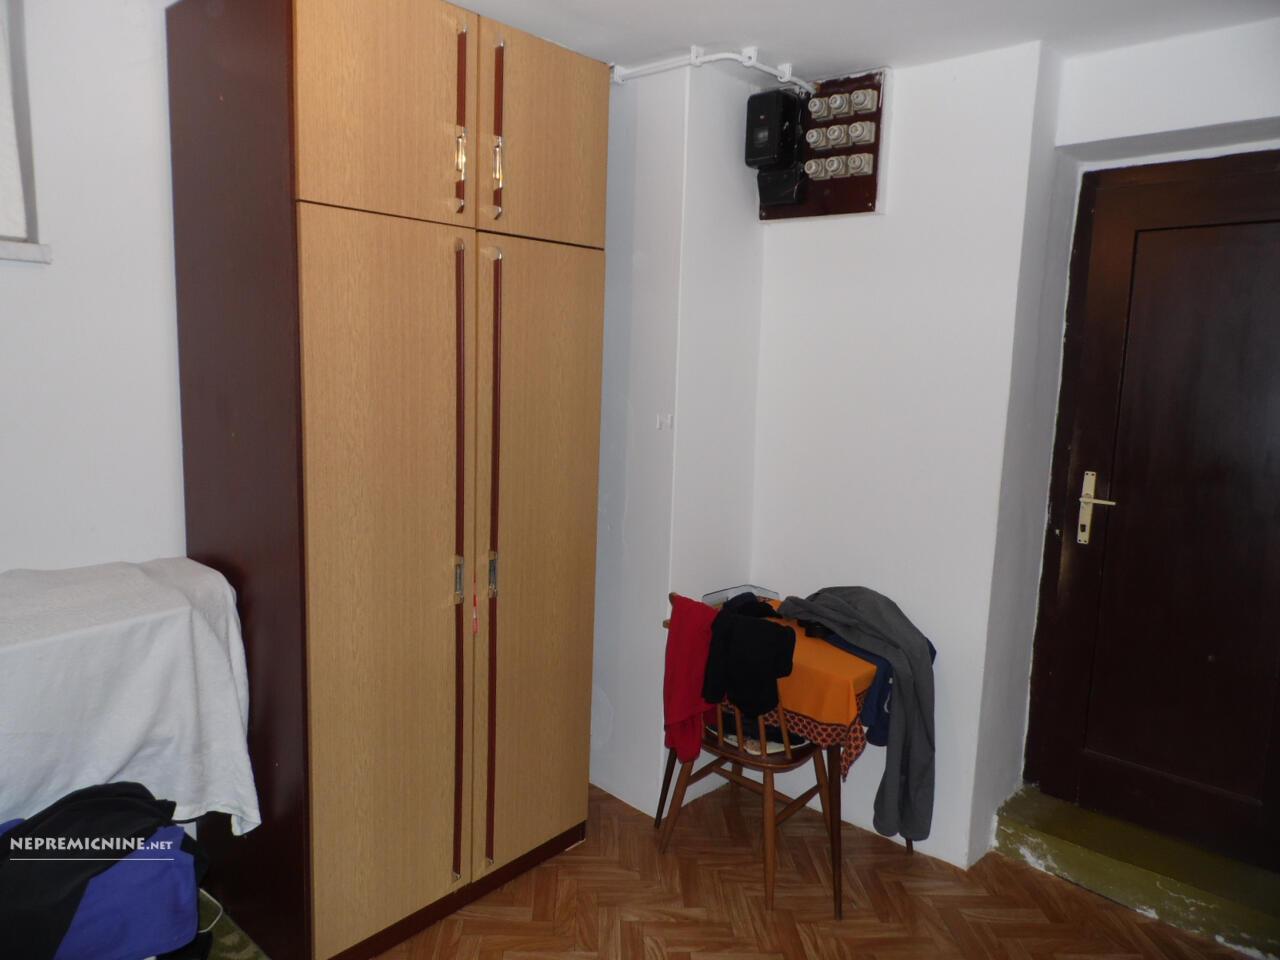 Prodaja, hiša - NOVO MESTO, KS BUČNA VAS 7